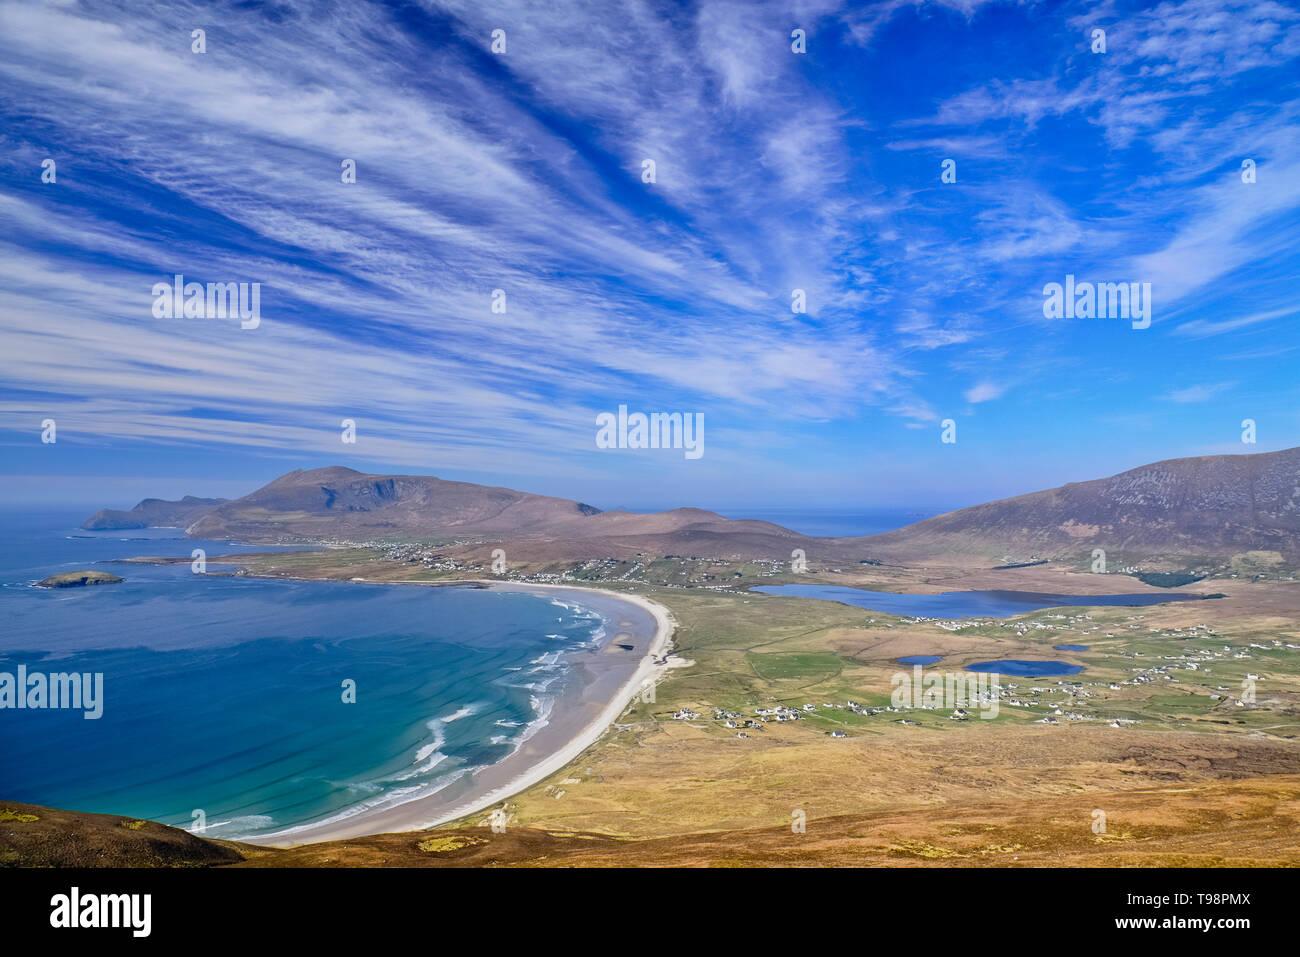 Ireland, County Mayo, View of Keel Beach from Minaun Cliffs. - Stock Image